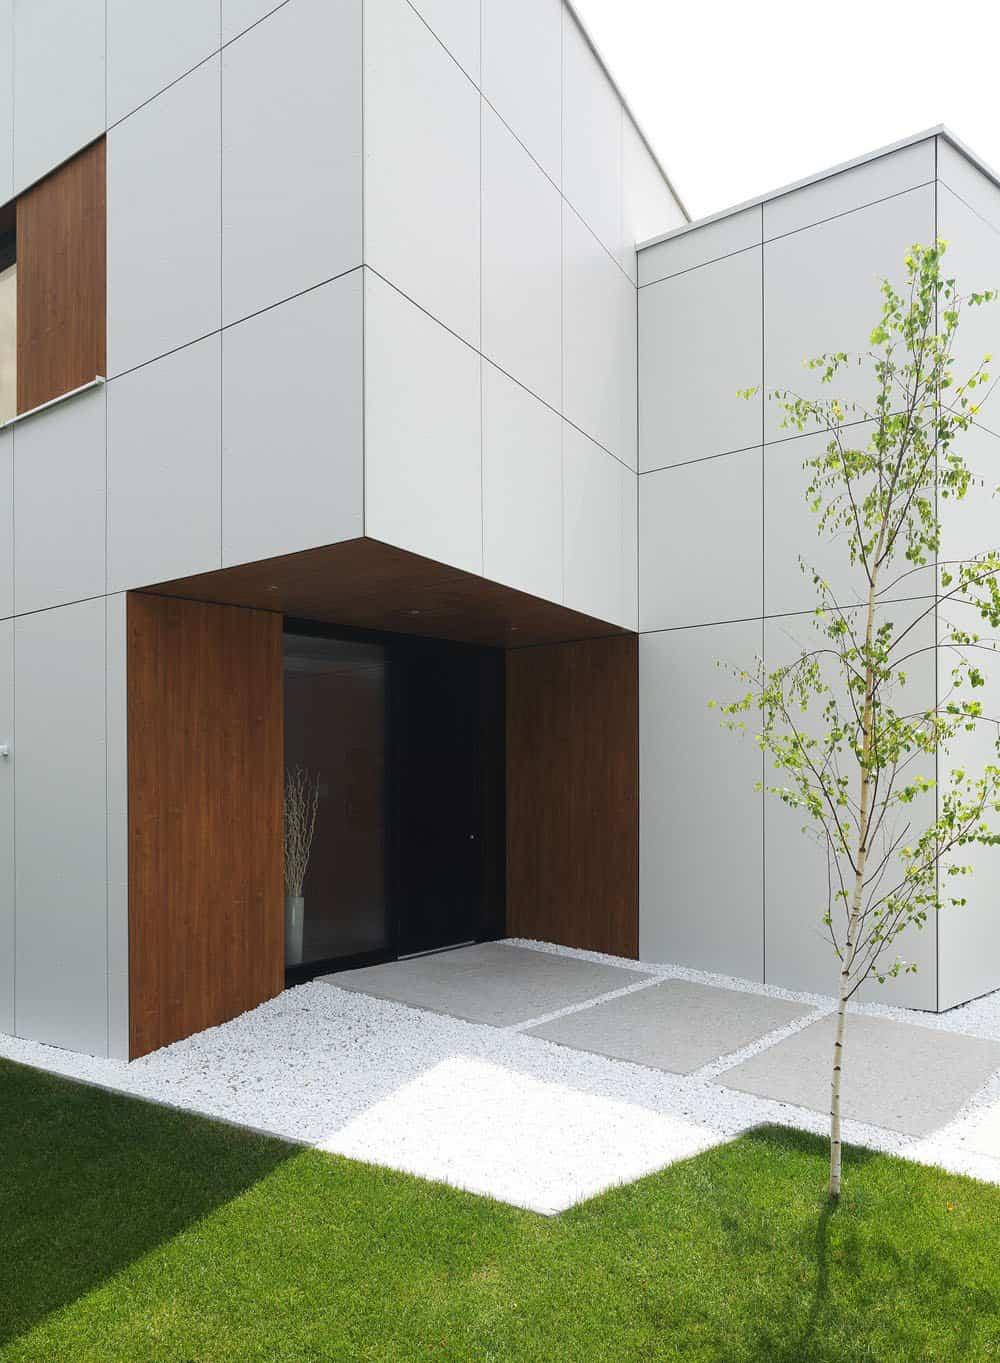 casa modular viena 13